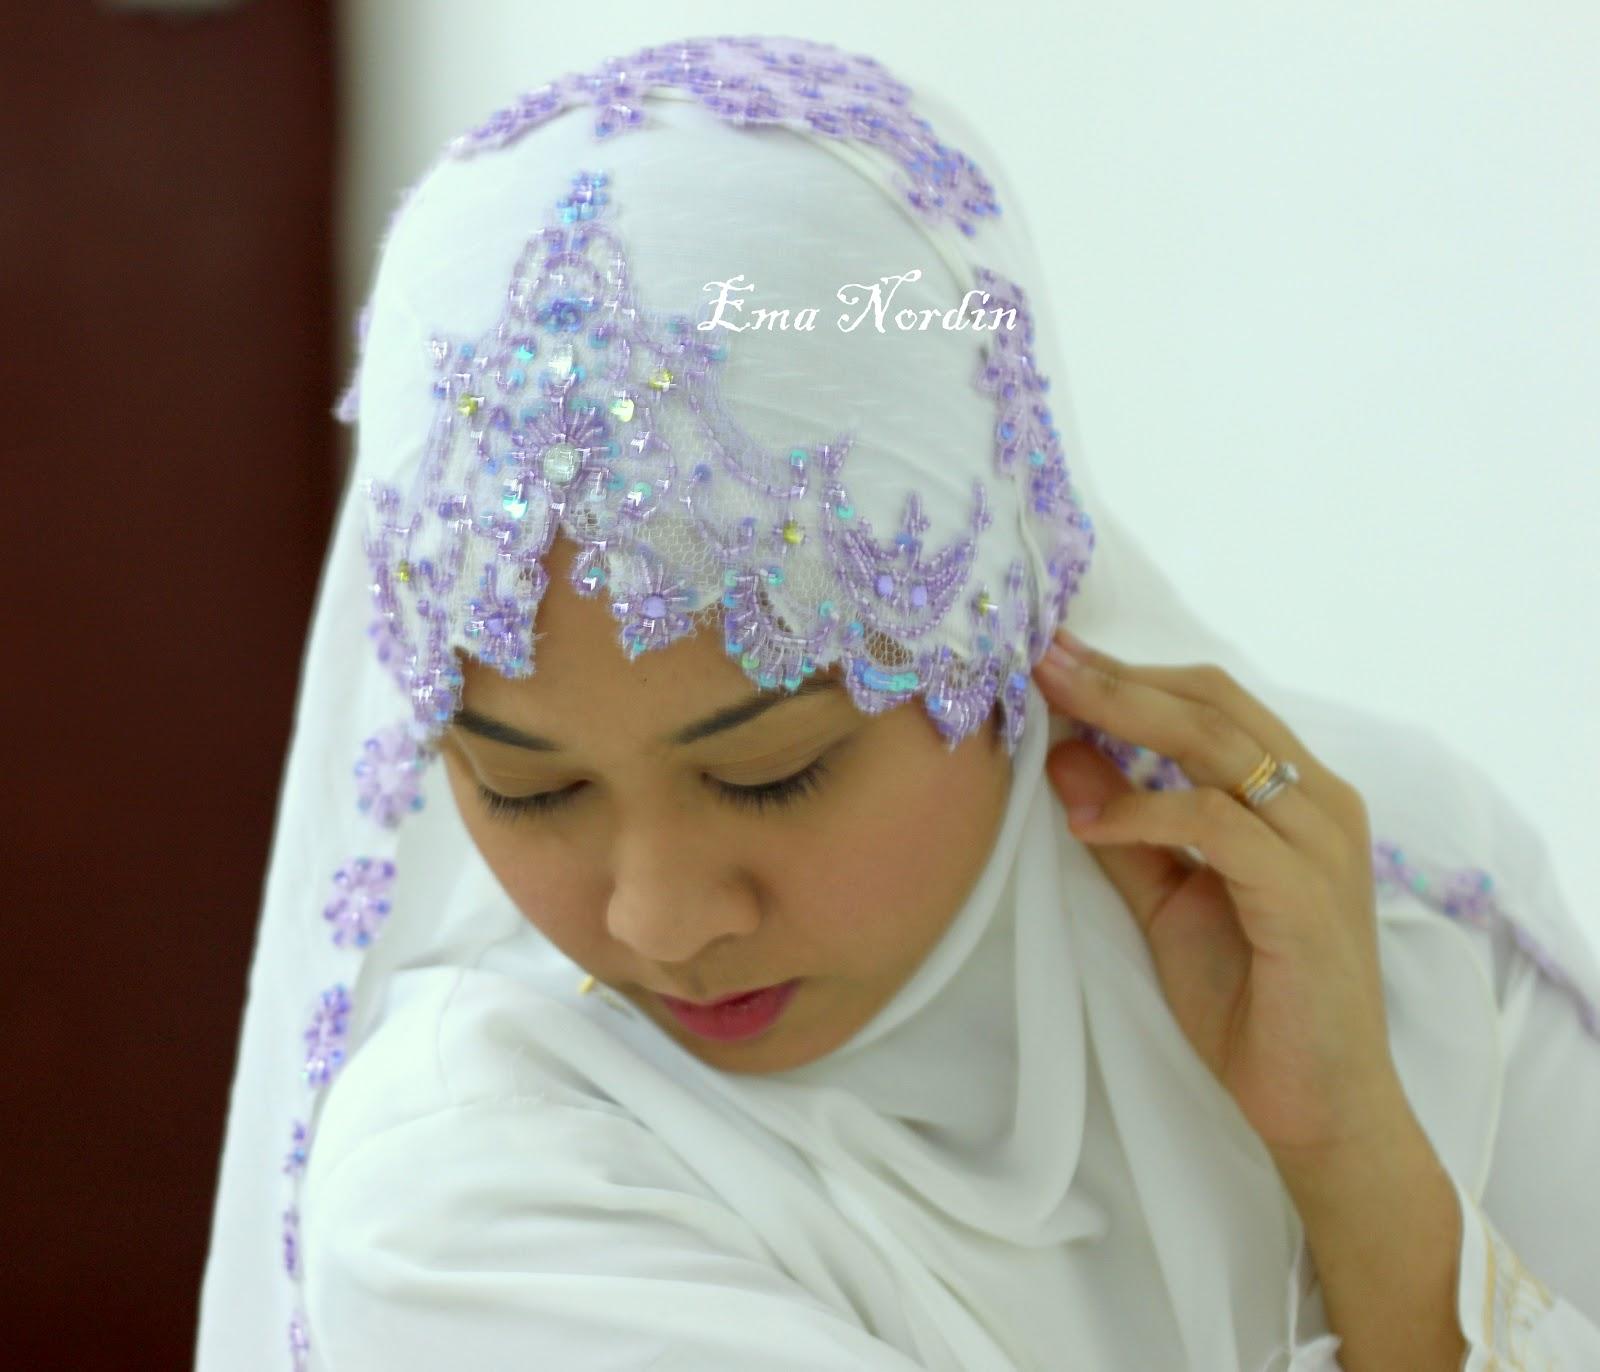 Pin Hijab Wedding Dress Abaya Fashion Ajilbabcom Portal Cake on ...